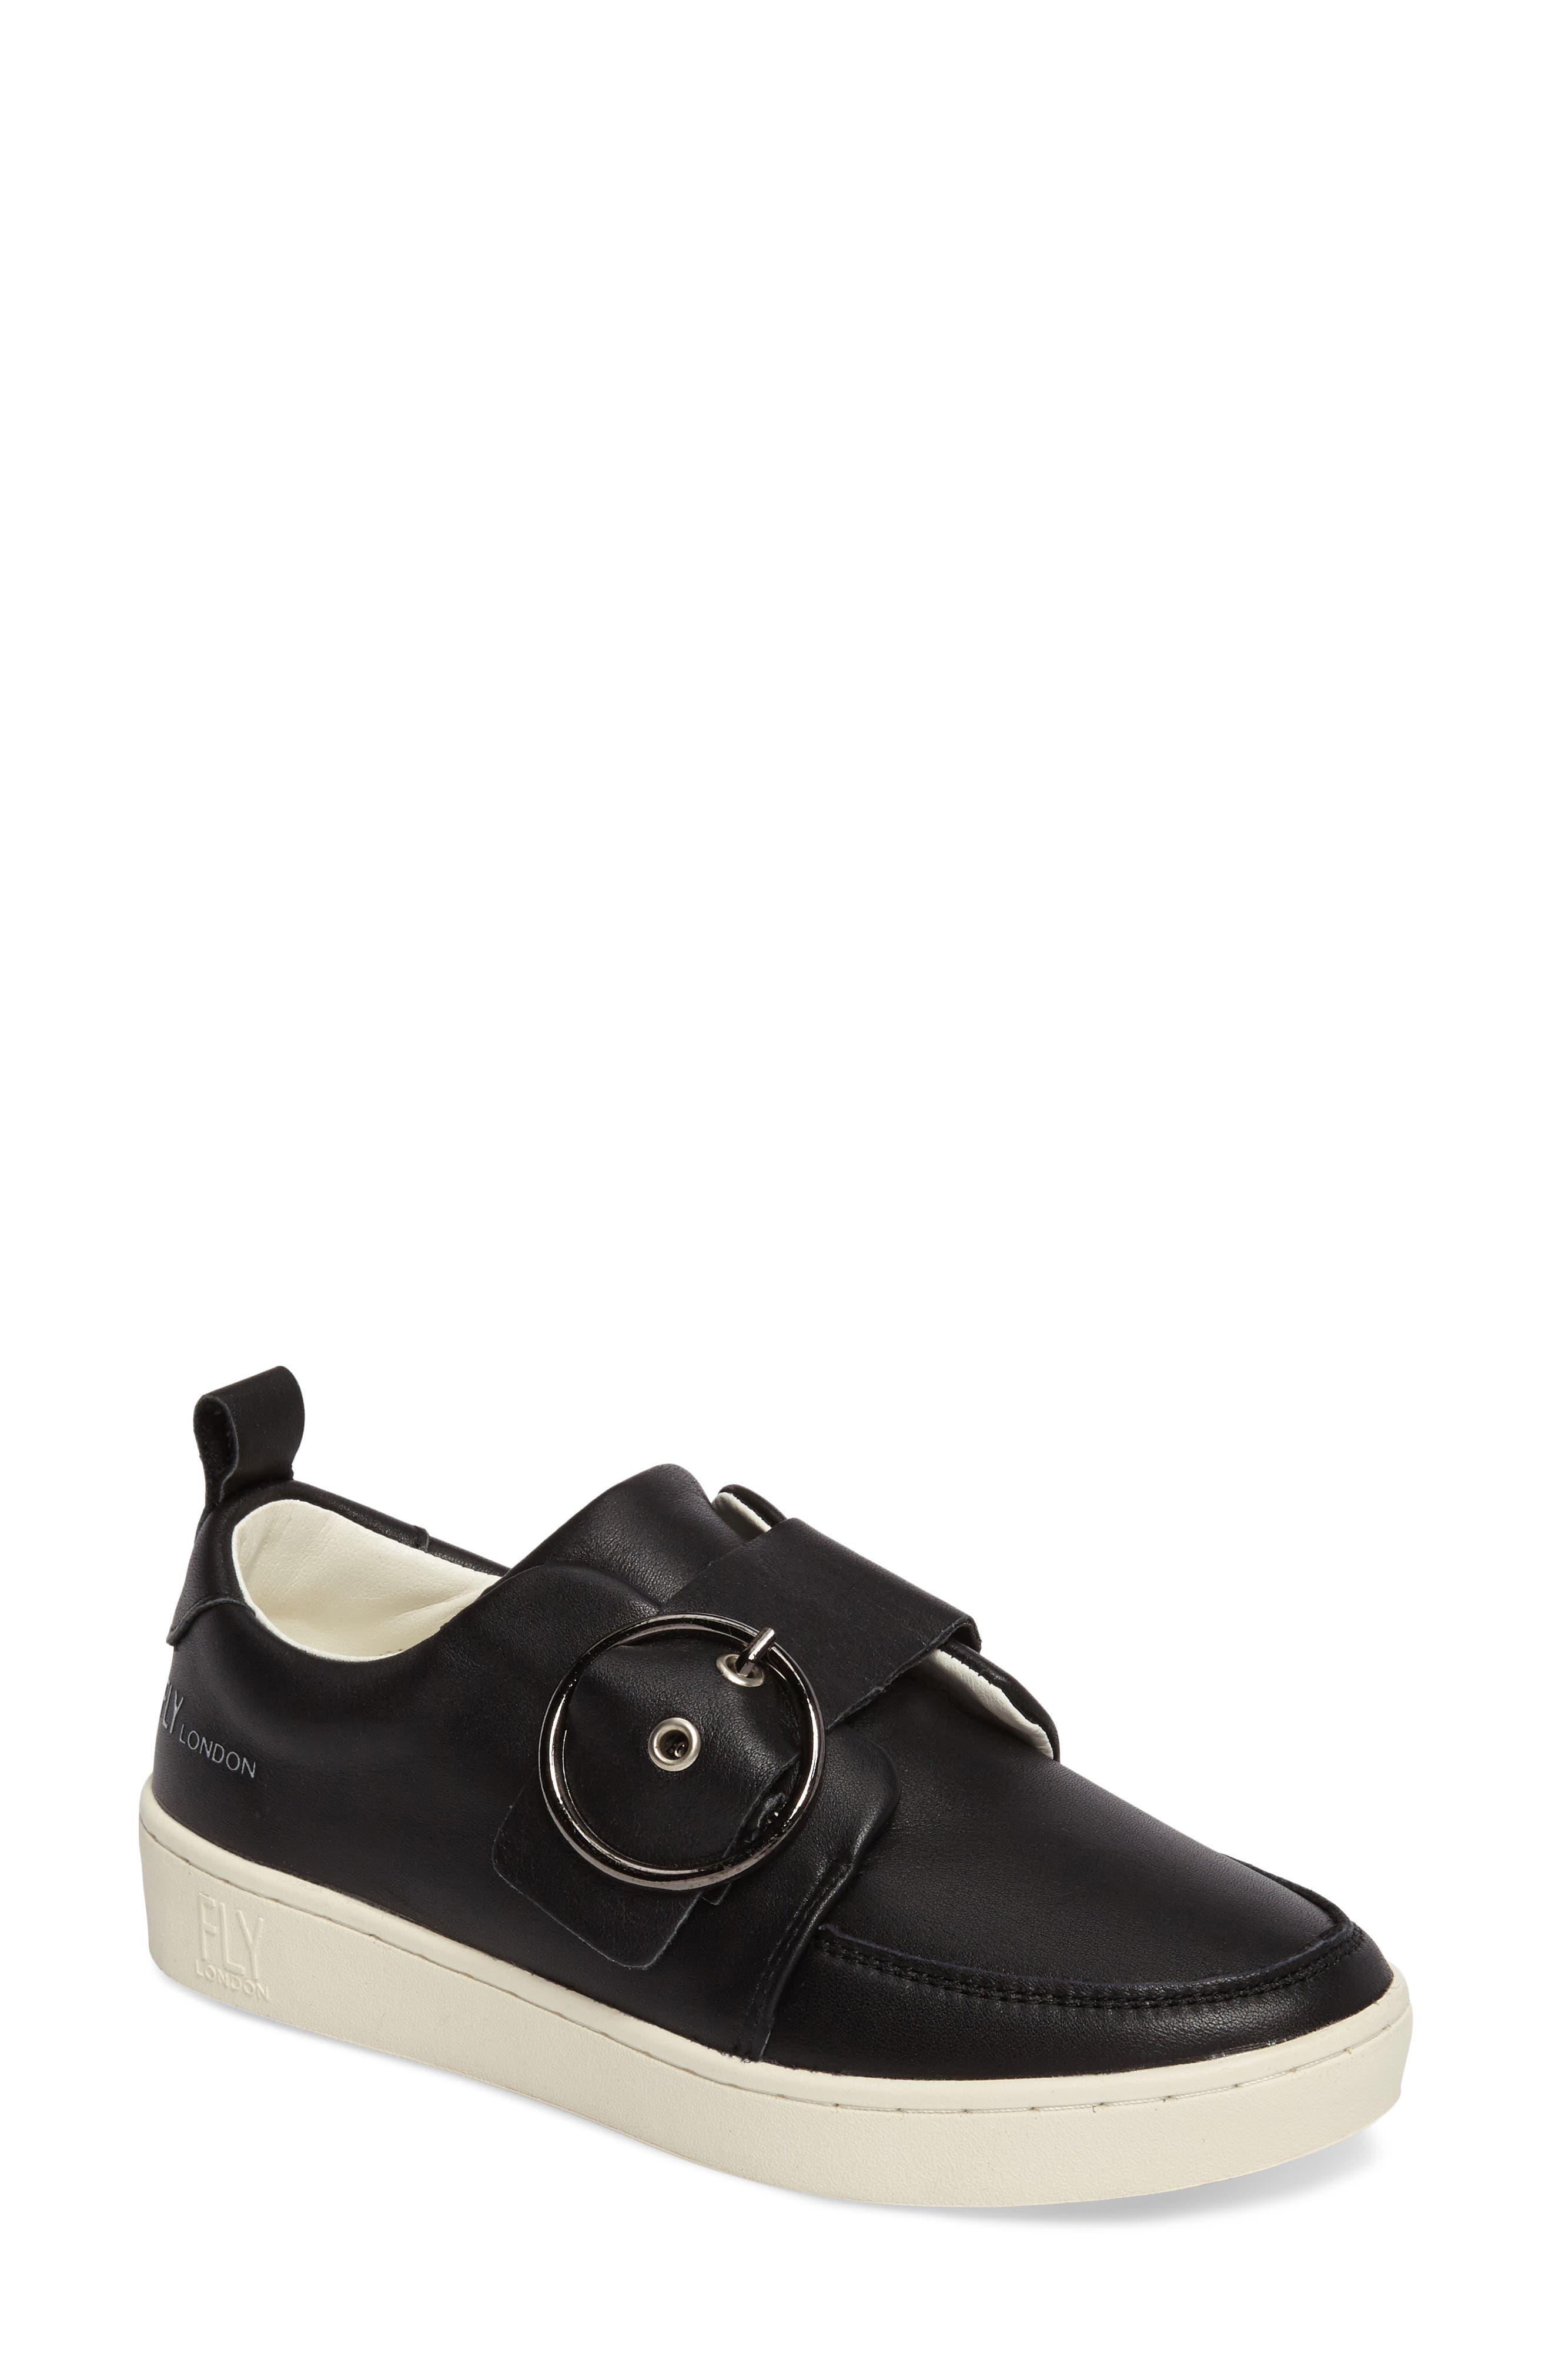 Mice Buckle Sneaker,                         Main,                         color, Black Leather